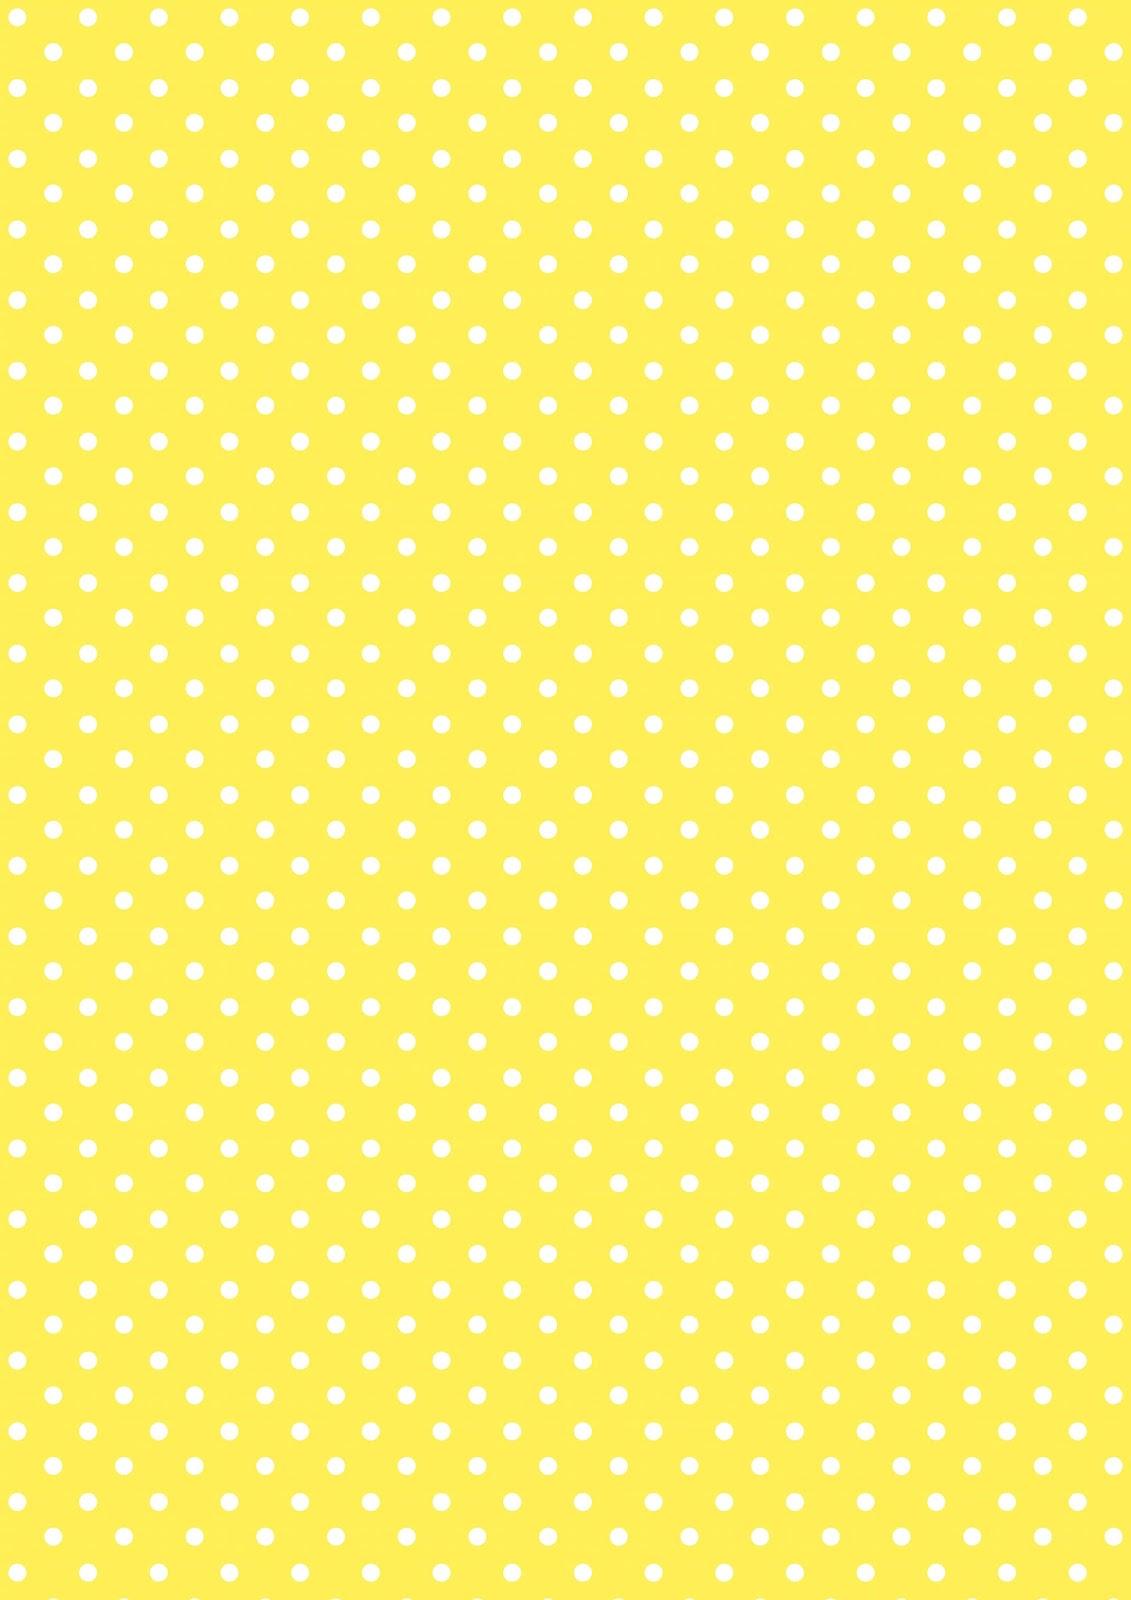 http://2.bp.blogspot.com/-apO8kM3HREA/VRLNP_g9lzI/AAAAAAAAic0/k3JnbofaJ0c/s1600/yellow_polka_dot_paper_A4.jpg